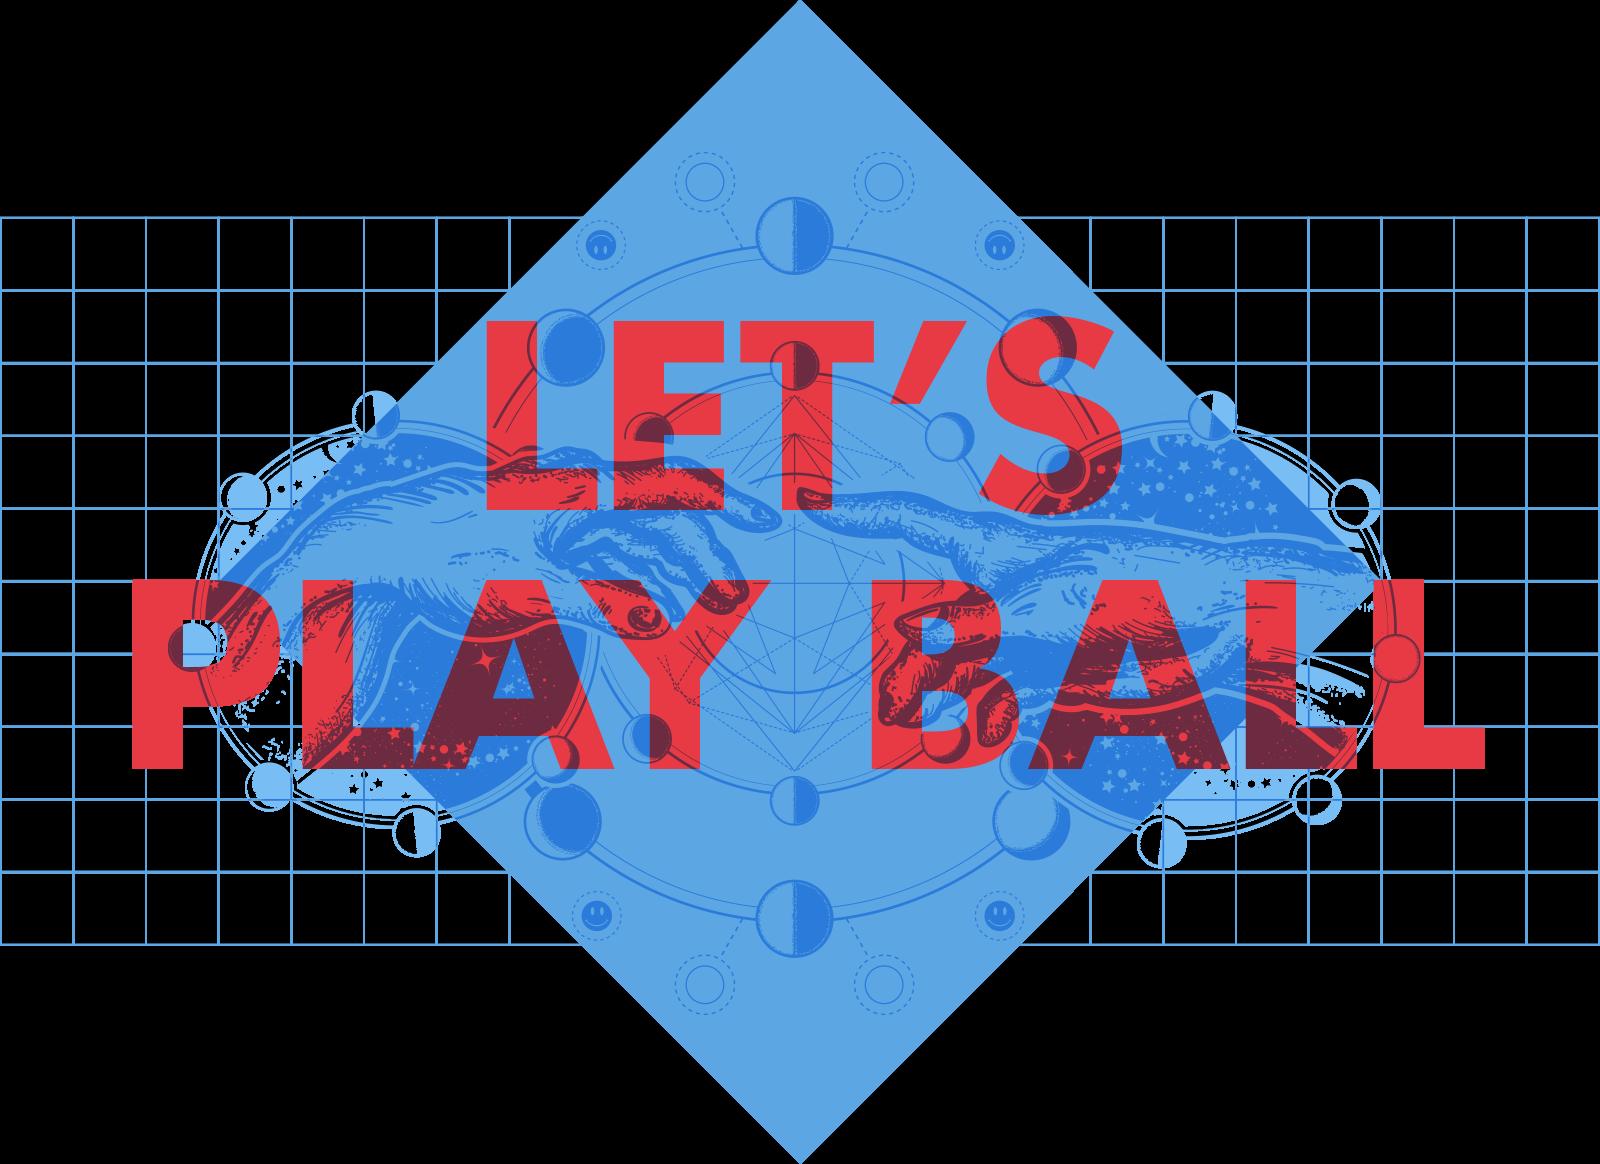 Social Media Content Marketer Pong Ping Letsplayball